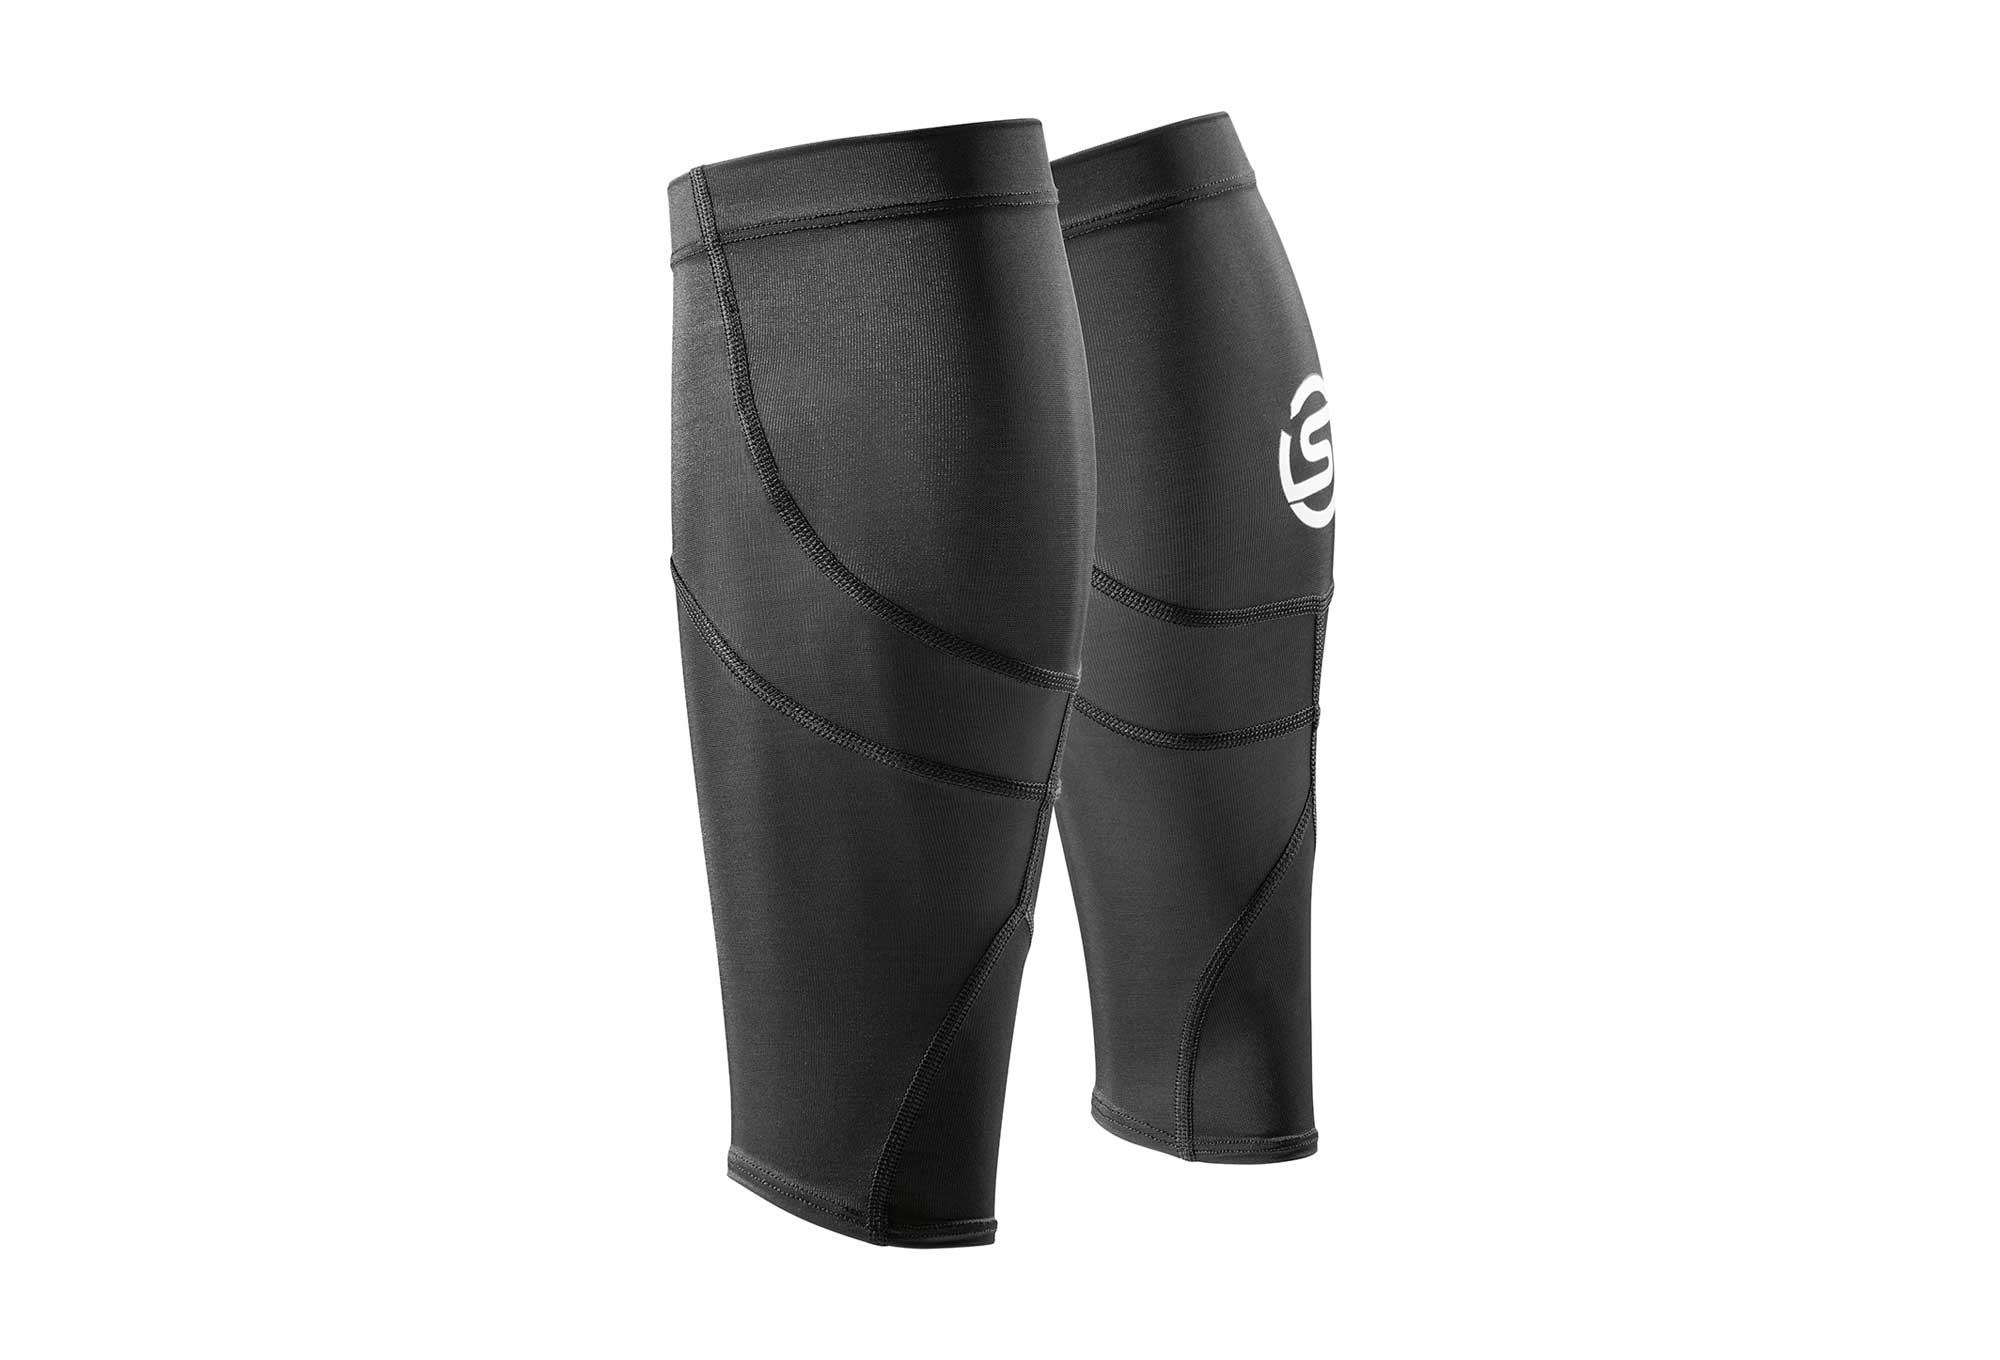 ef24407979f3f4 Skins Compression Sleeves Essentials Mx Black Unisex